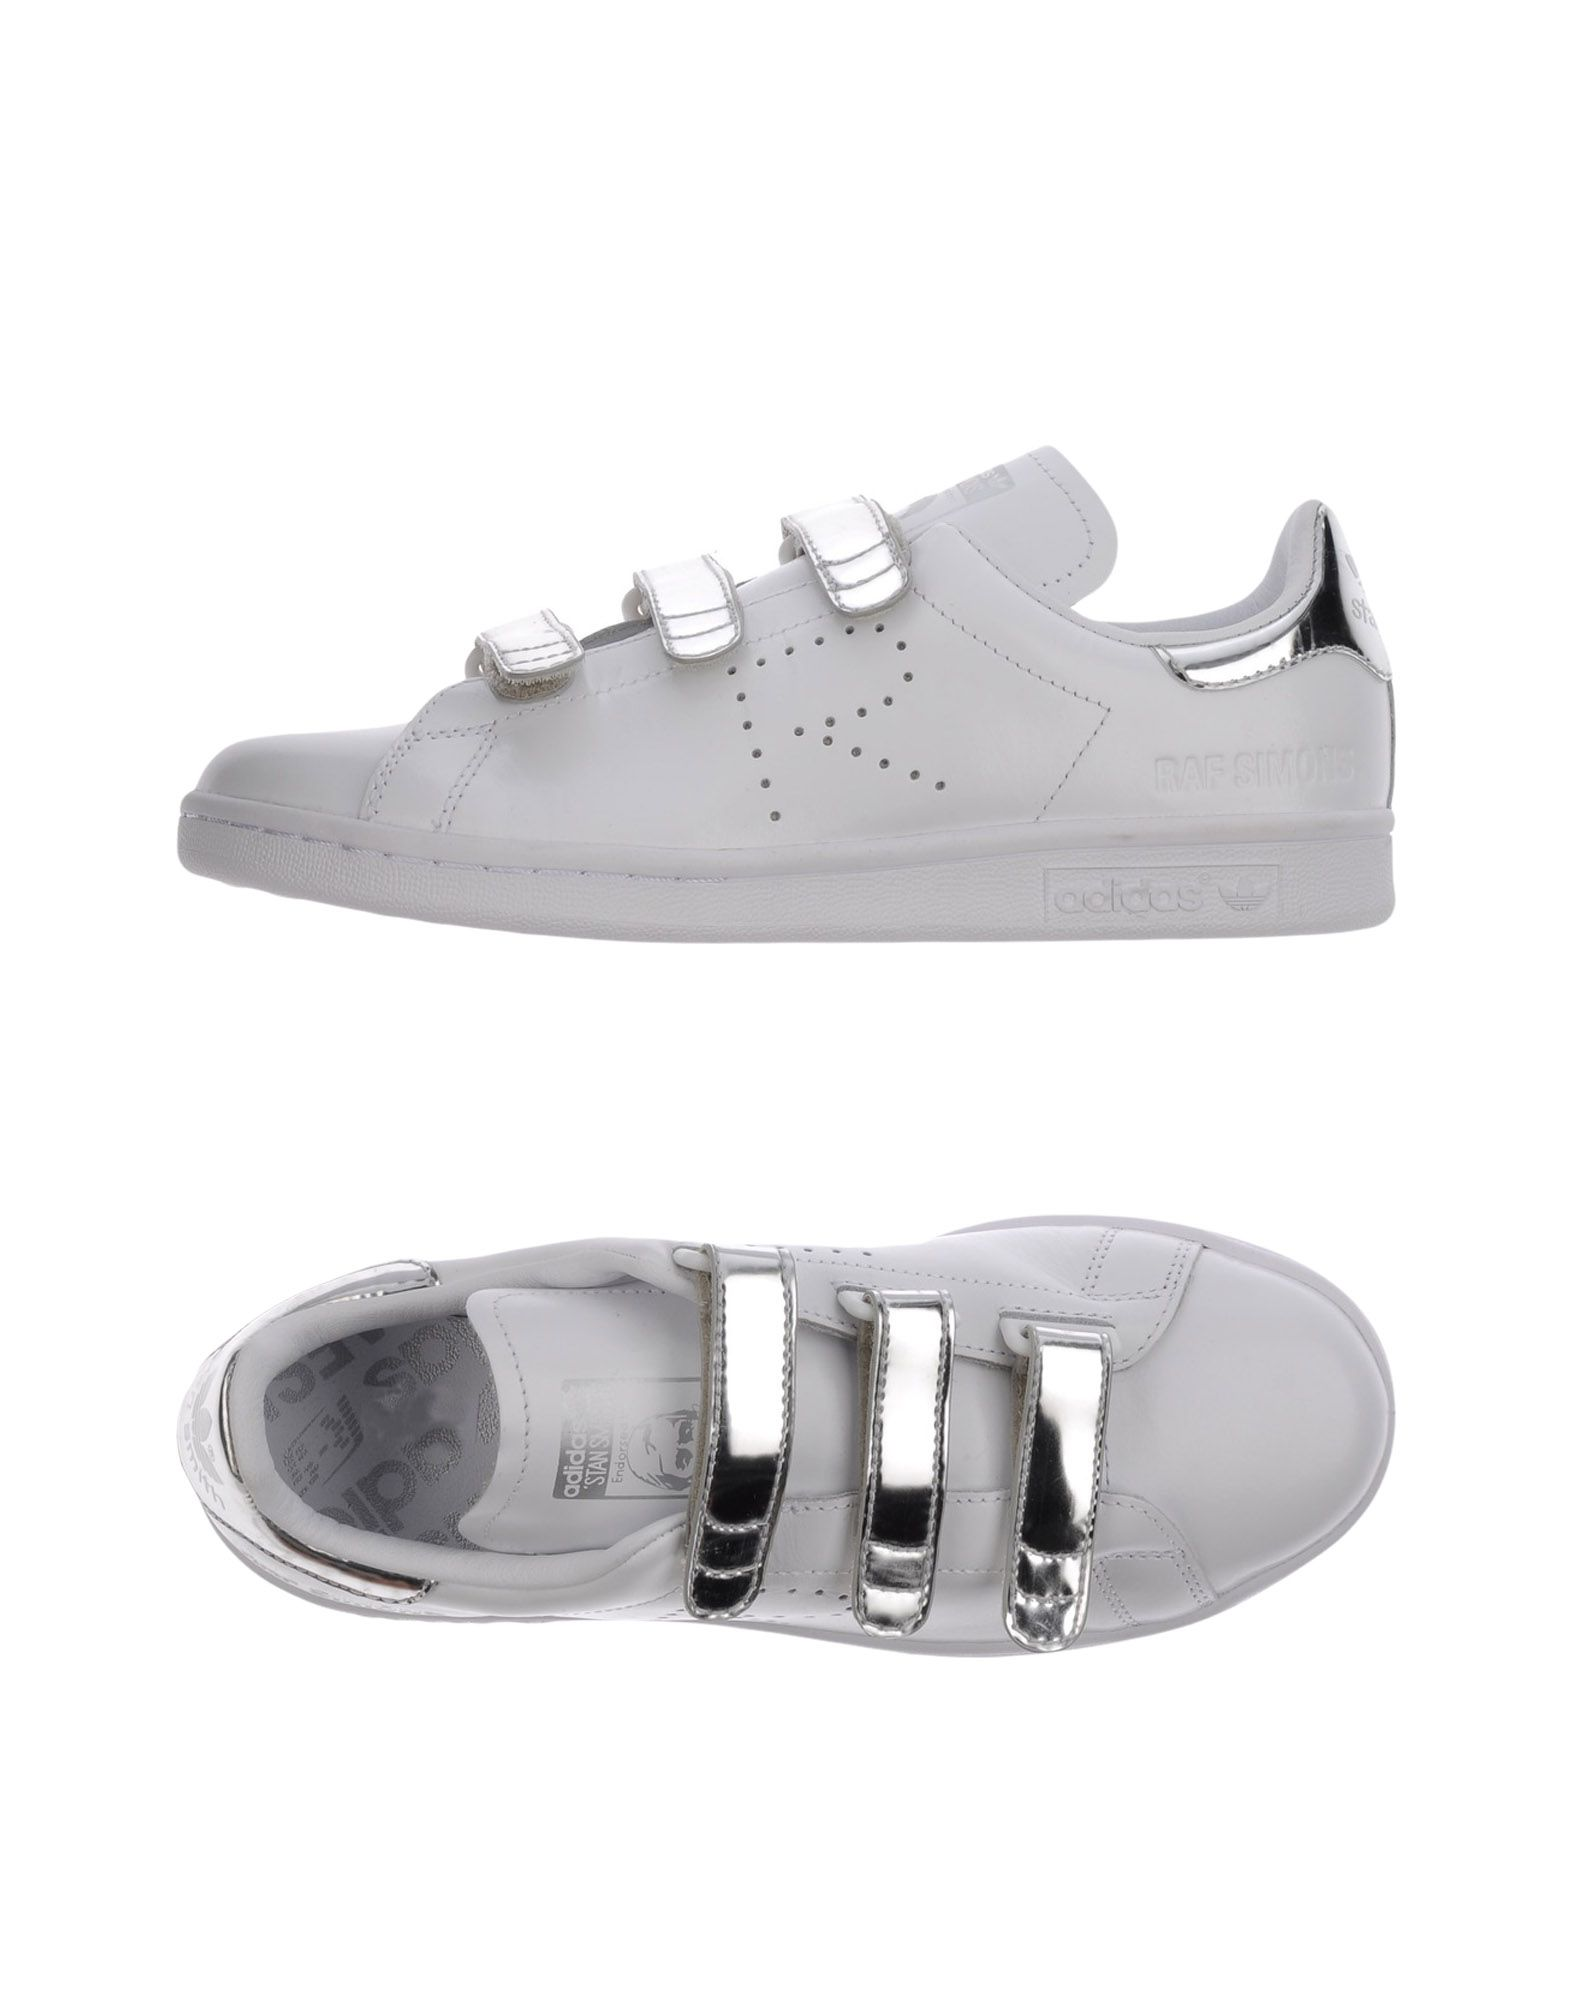 ADIDAS by RAF SIMONS Низкие кеды и кроссовки raf simons x adidas сандалии